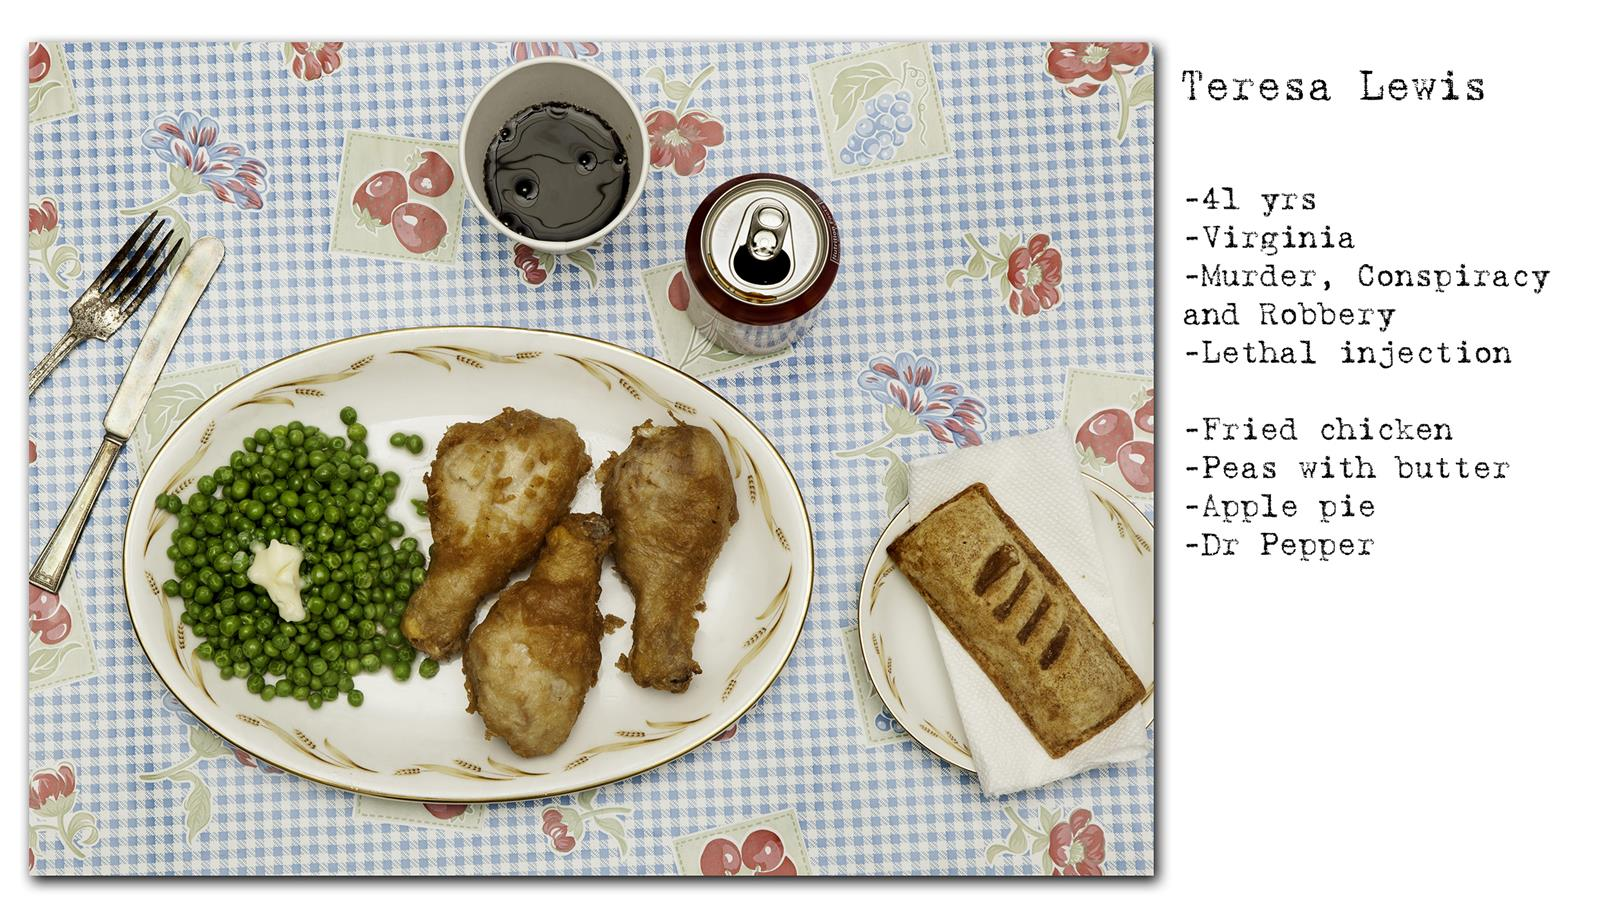 Death Row Prisoner's Last Meal (12)